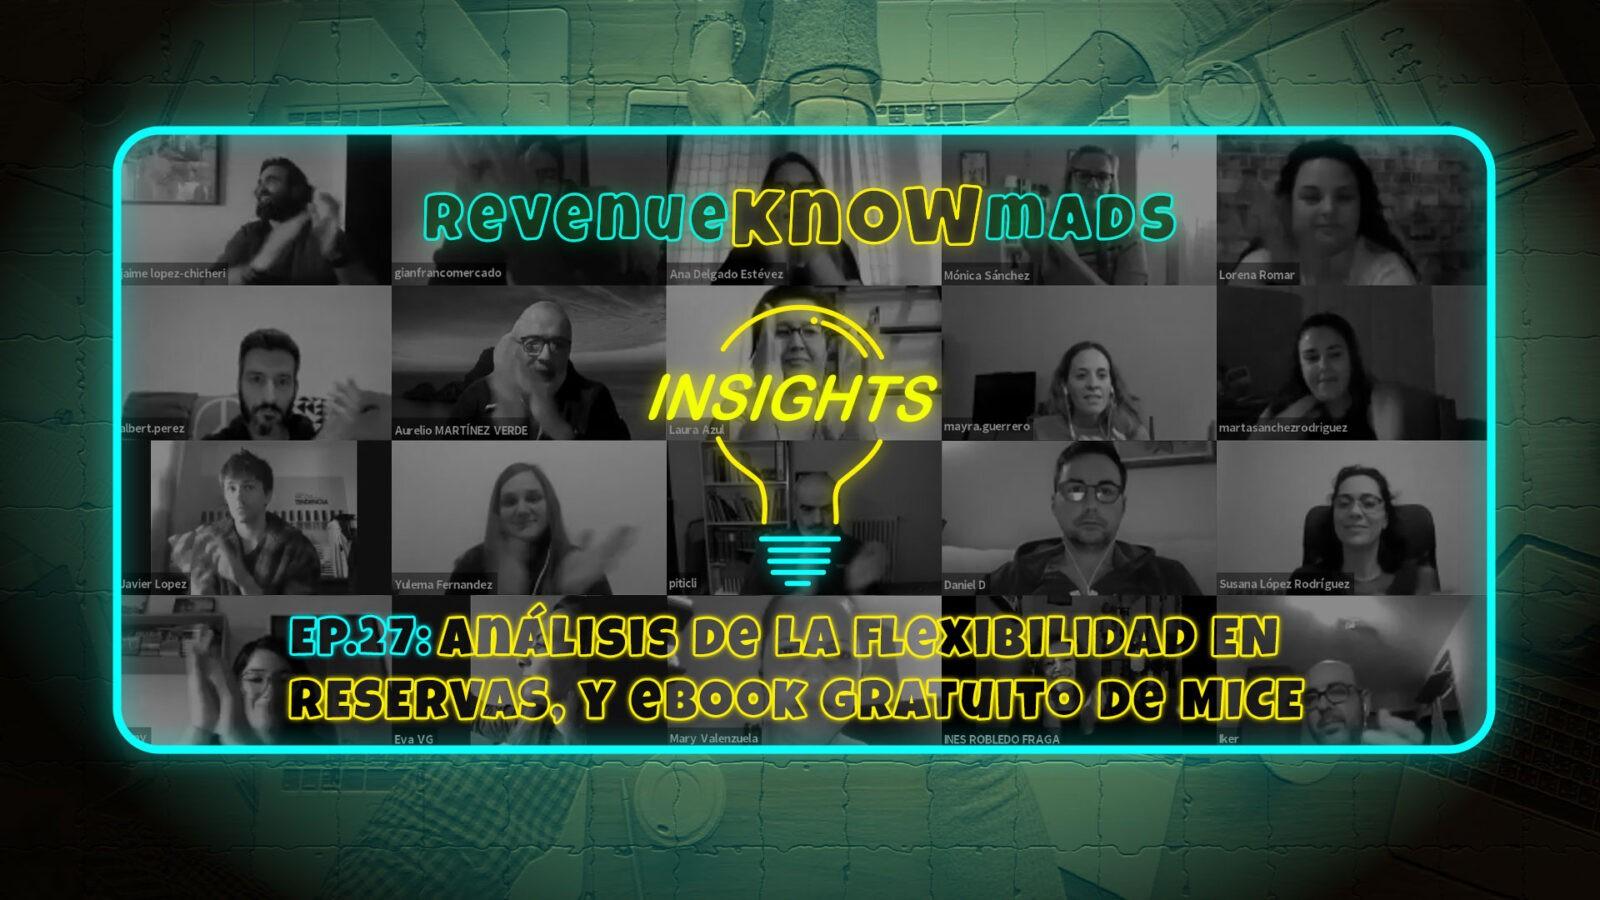 RevenueKnowmads Insight 27